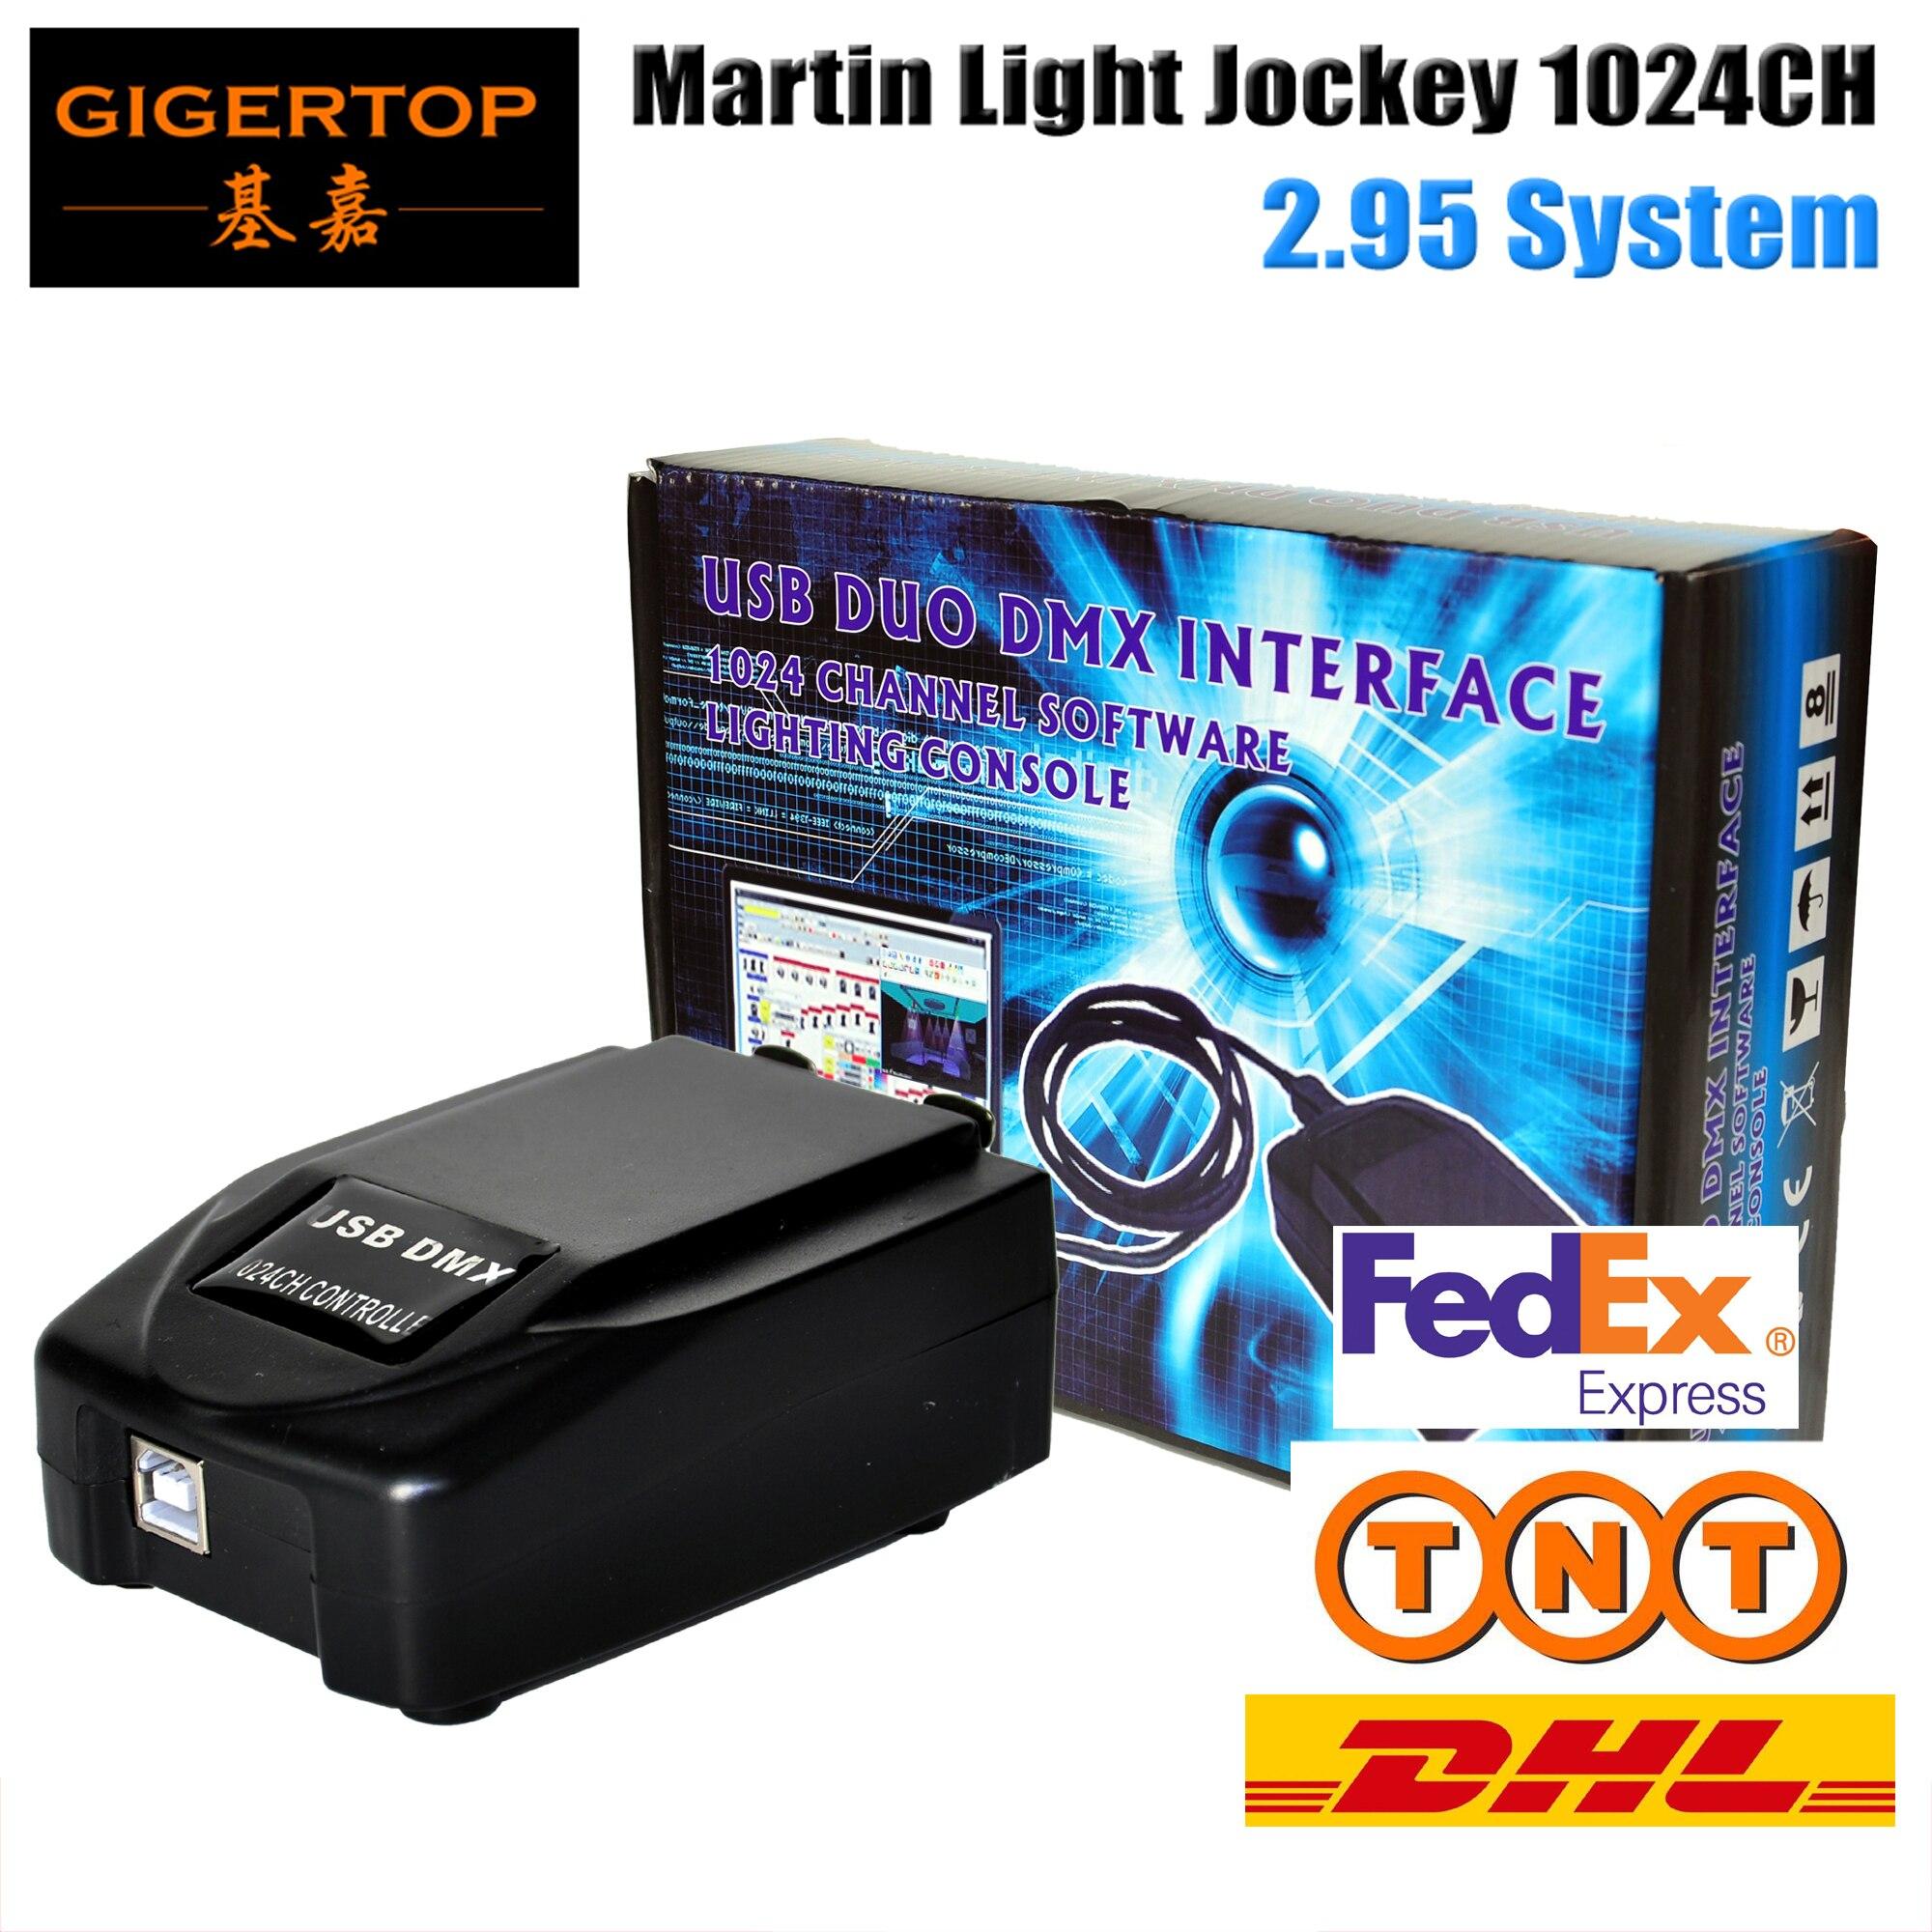 Livraison gratuite Martin lumière jockey USB 1024 DMX 512 contrôleur DJ, Martin lightjockey 3 broches 1024 USB DMX contrôleur led lumière de scène